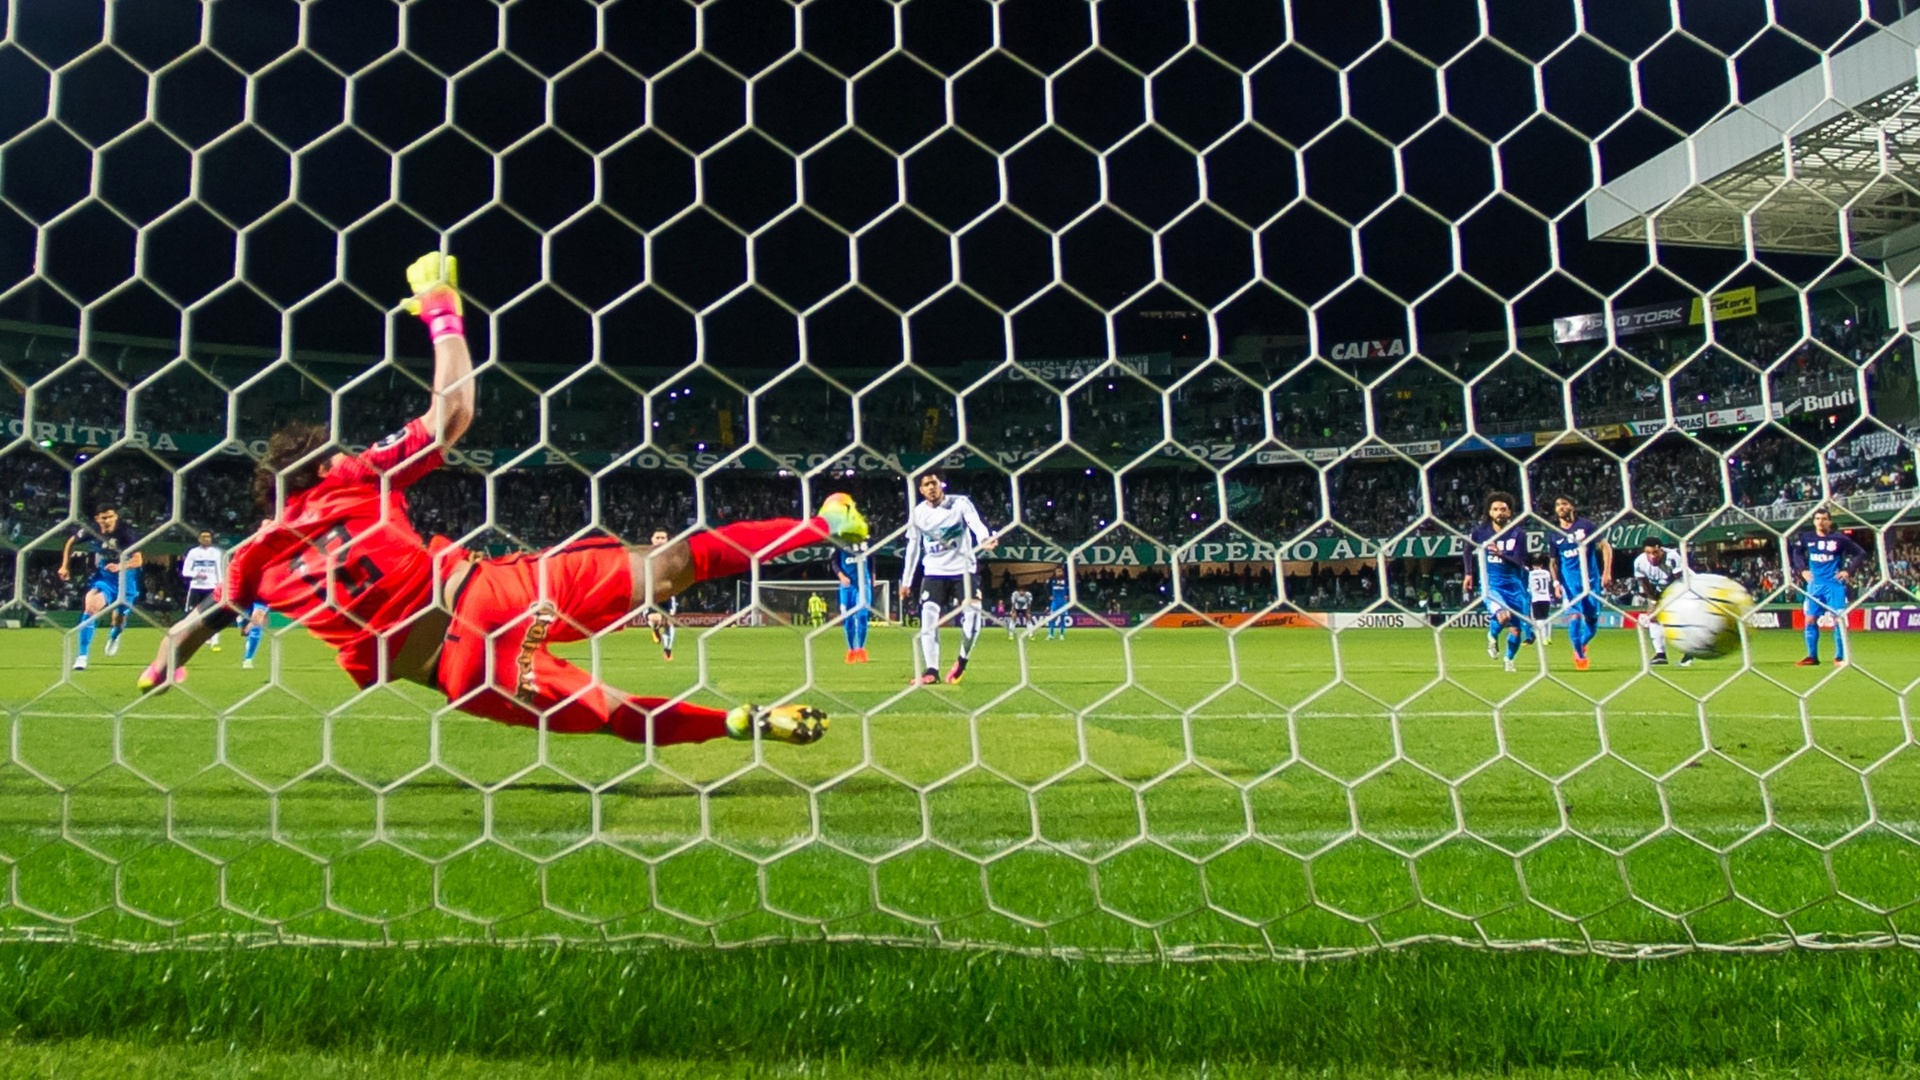 Leandro faz de pênalti gol do Coritiba contra o Corinthians